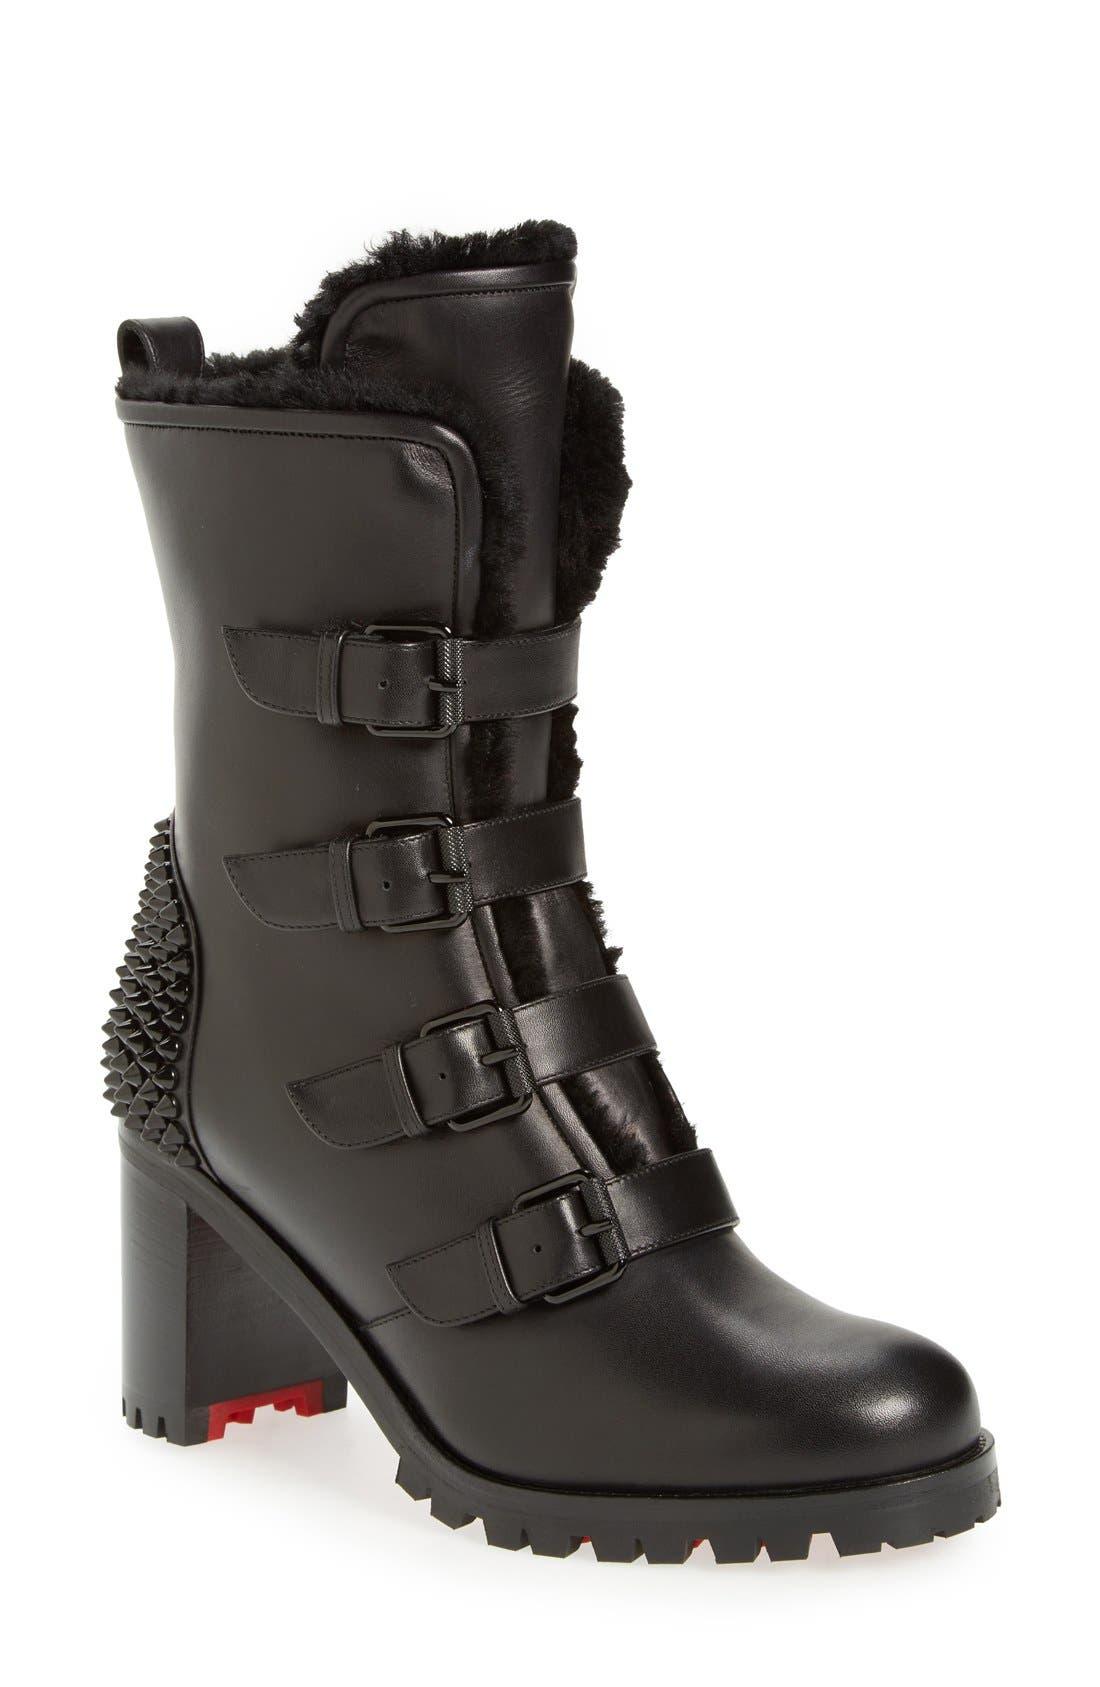 Alternate Image 1 Selected - Christian Louboutin 'Glorymount' Studded Buckle Boot